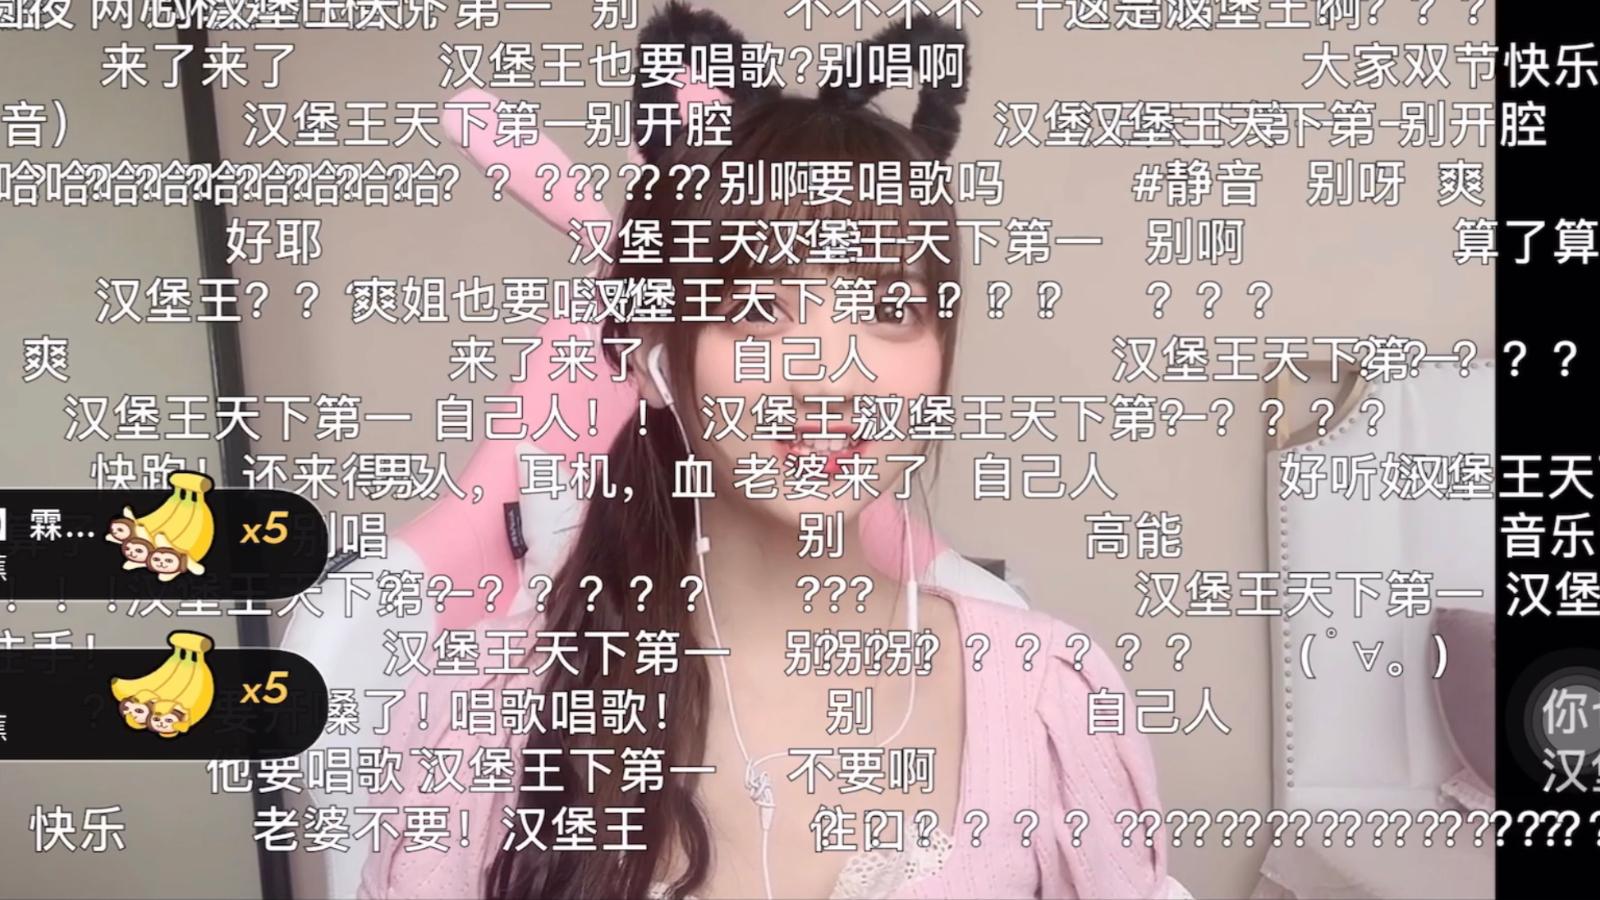 【Kyokyo】中秋国庆快乐!